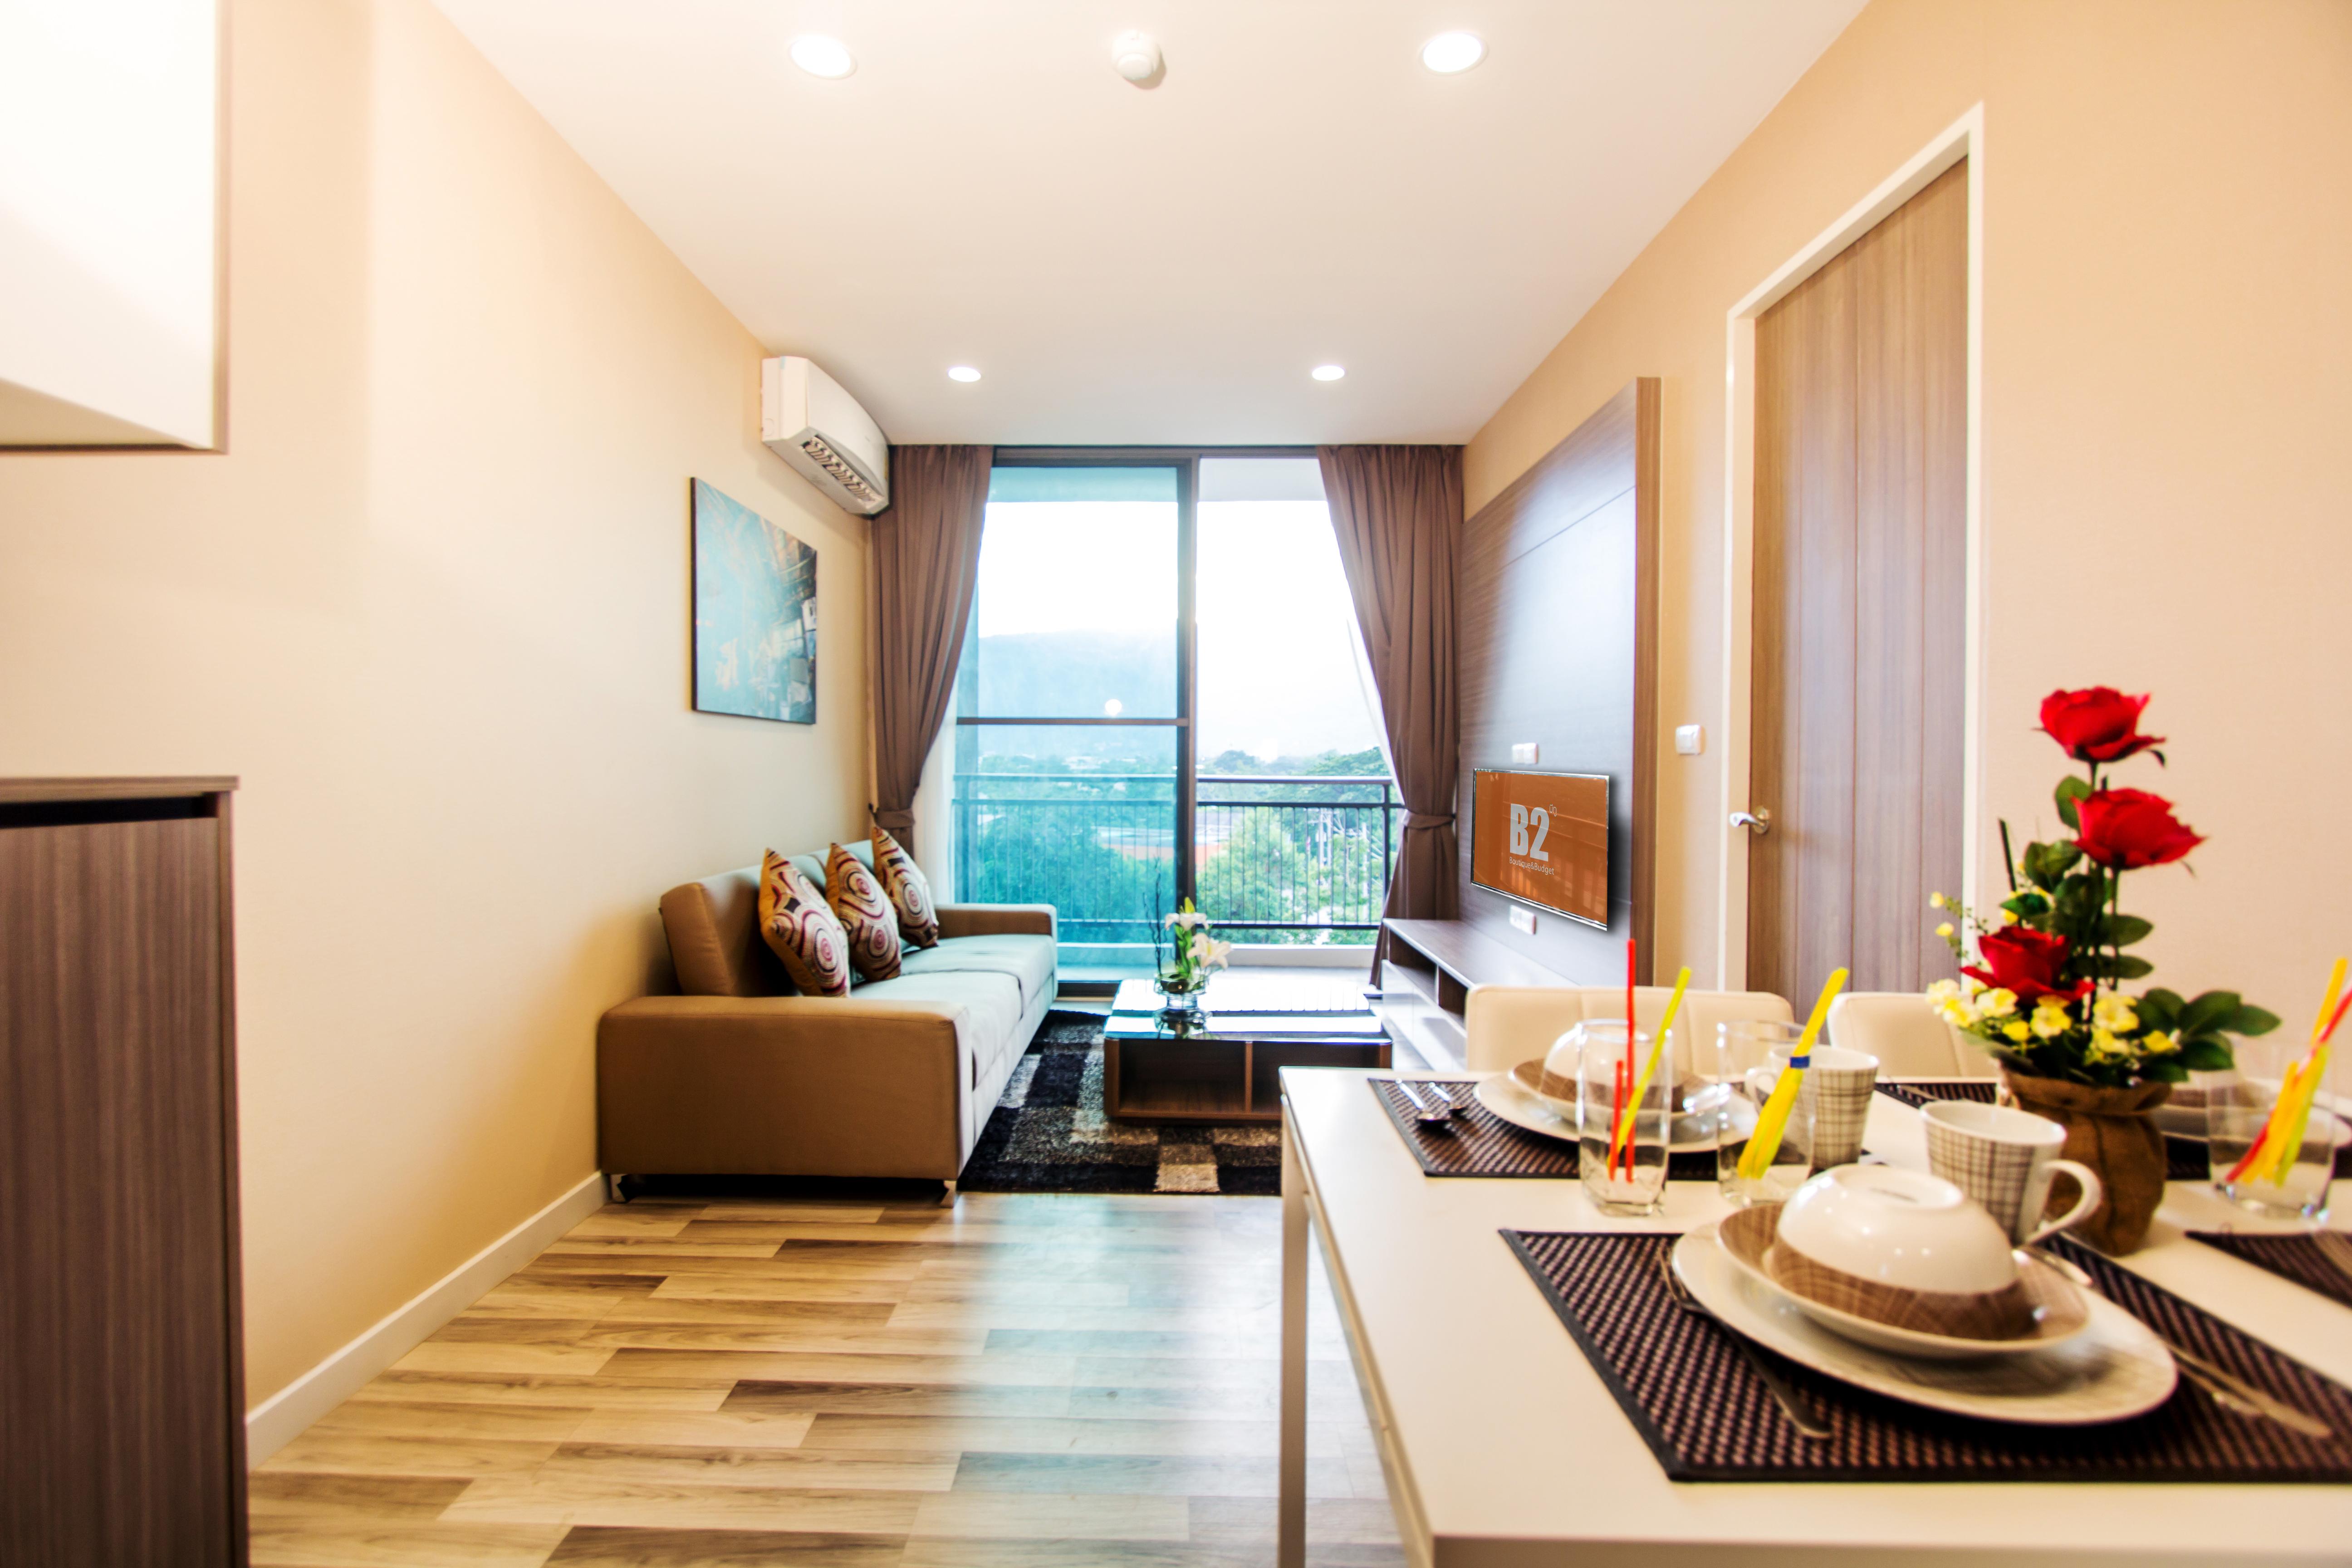 b2pano-suiteroom